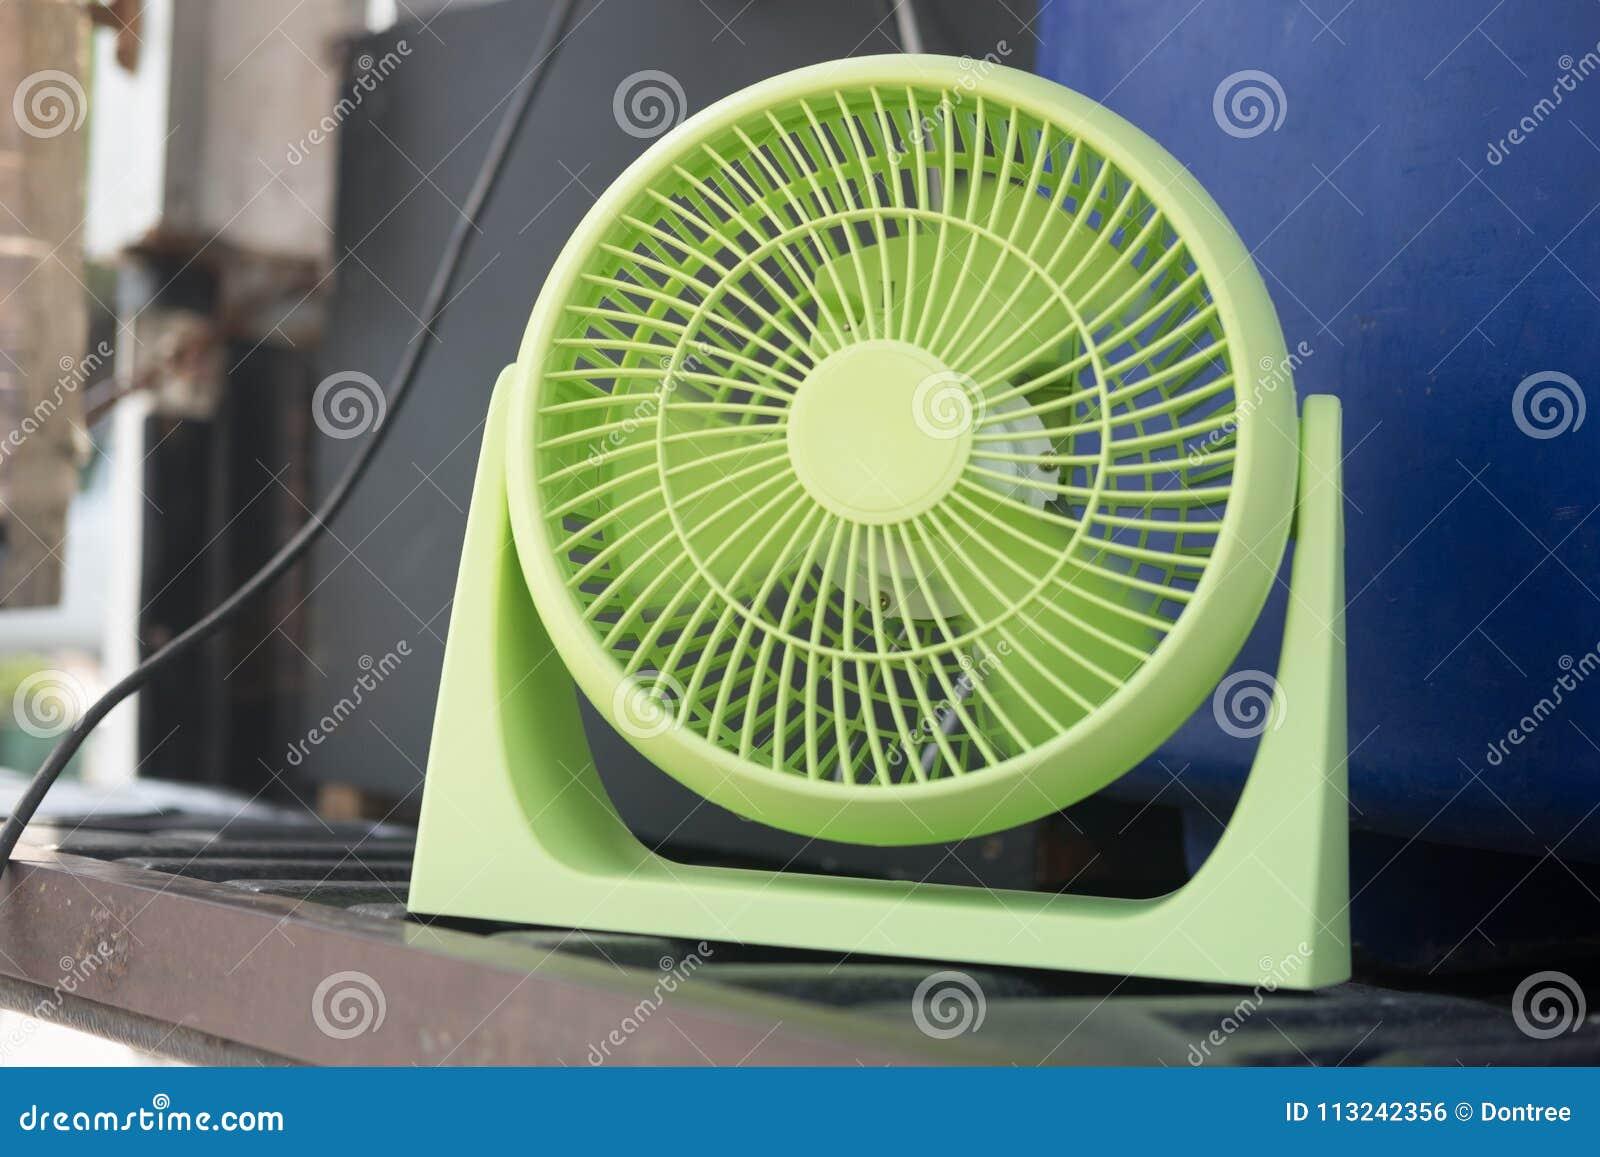 Leuke Ventilator Huis : Leuke kleine elektrische ventilator stock foto afbeelding